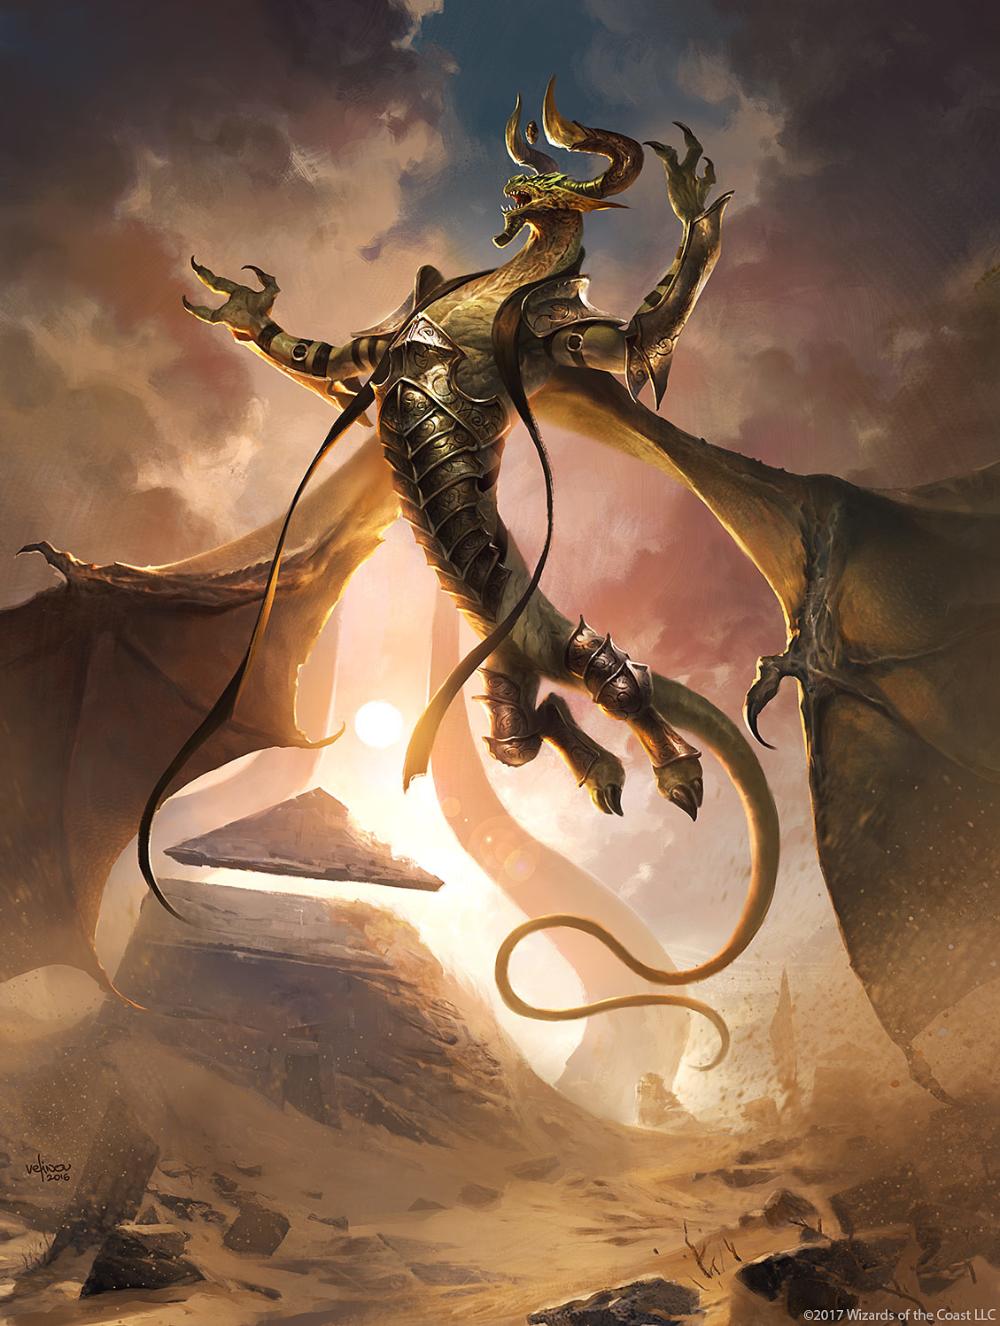 Artstation Nicol Bolas The Deceiver Svetlin Velinov Mtg Art Dragon Art Fantasy Creatures